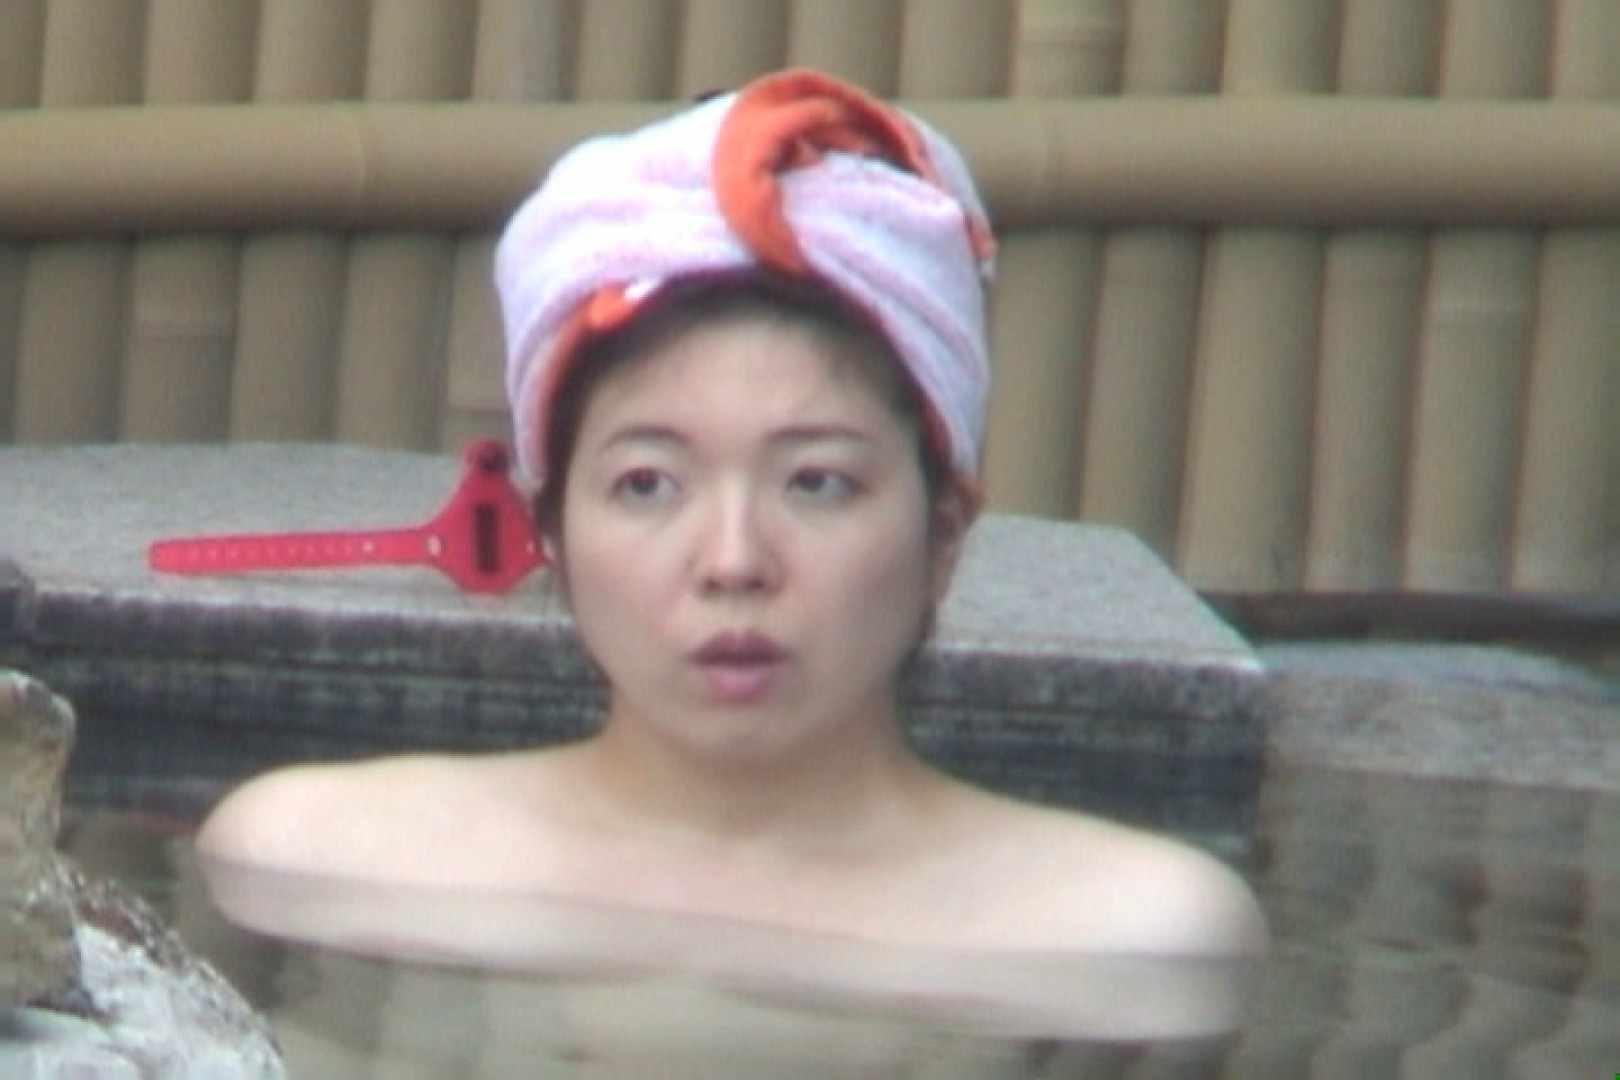 Aquaな露天風呂Vol.573 盗撮シリーズ | 露天風呂編  78PIX 69